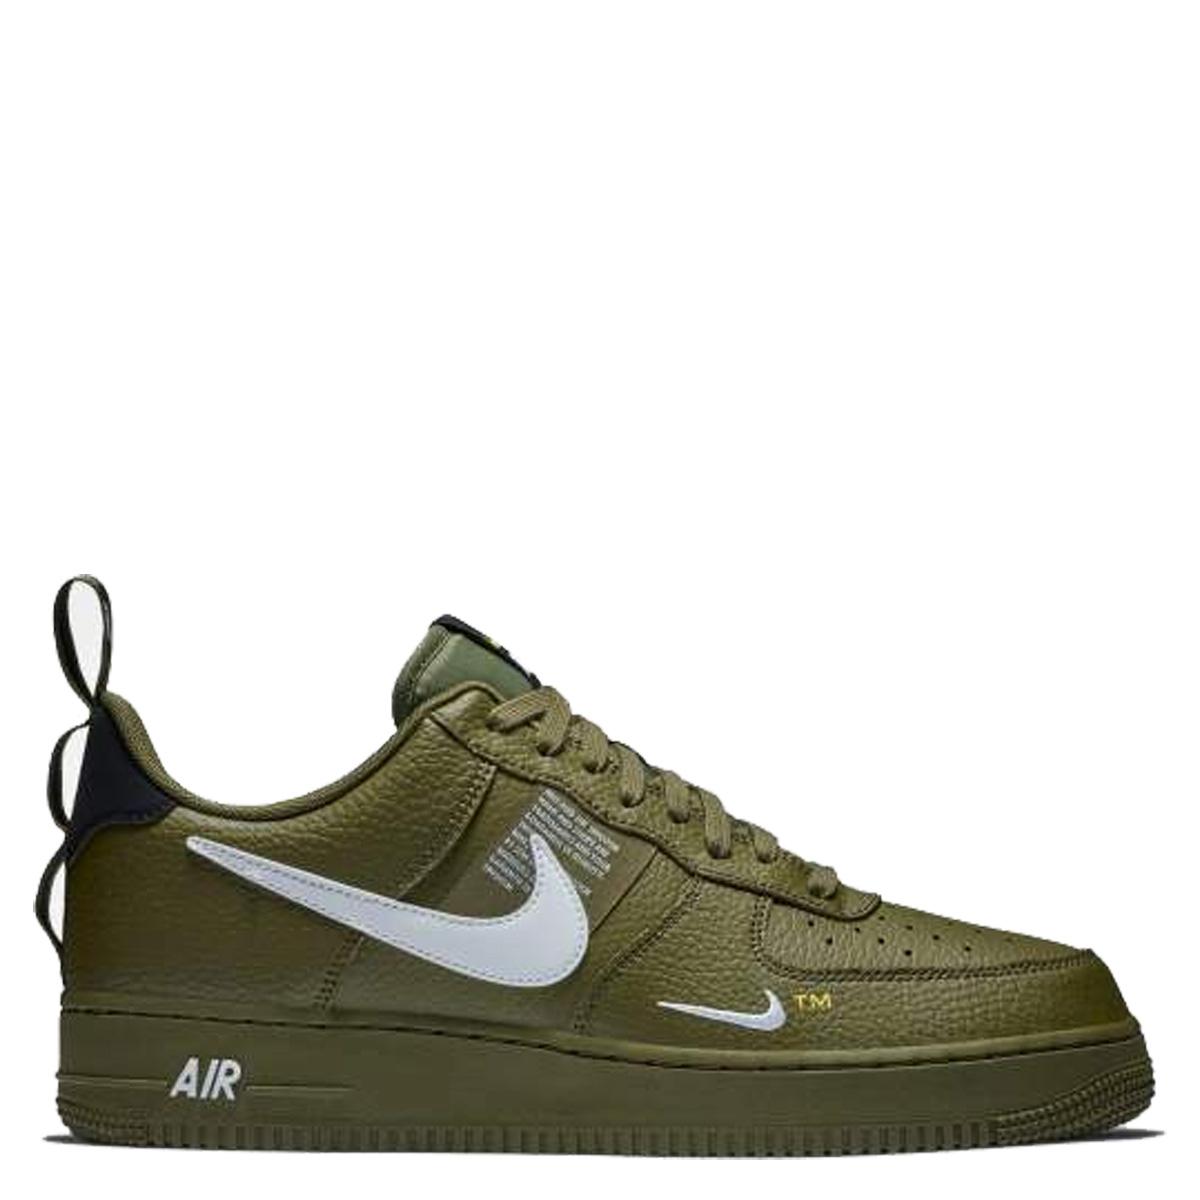 nike air force 1 07 verde oliva